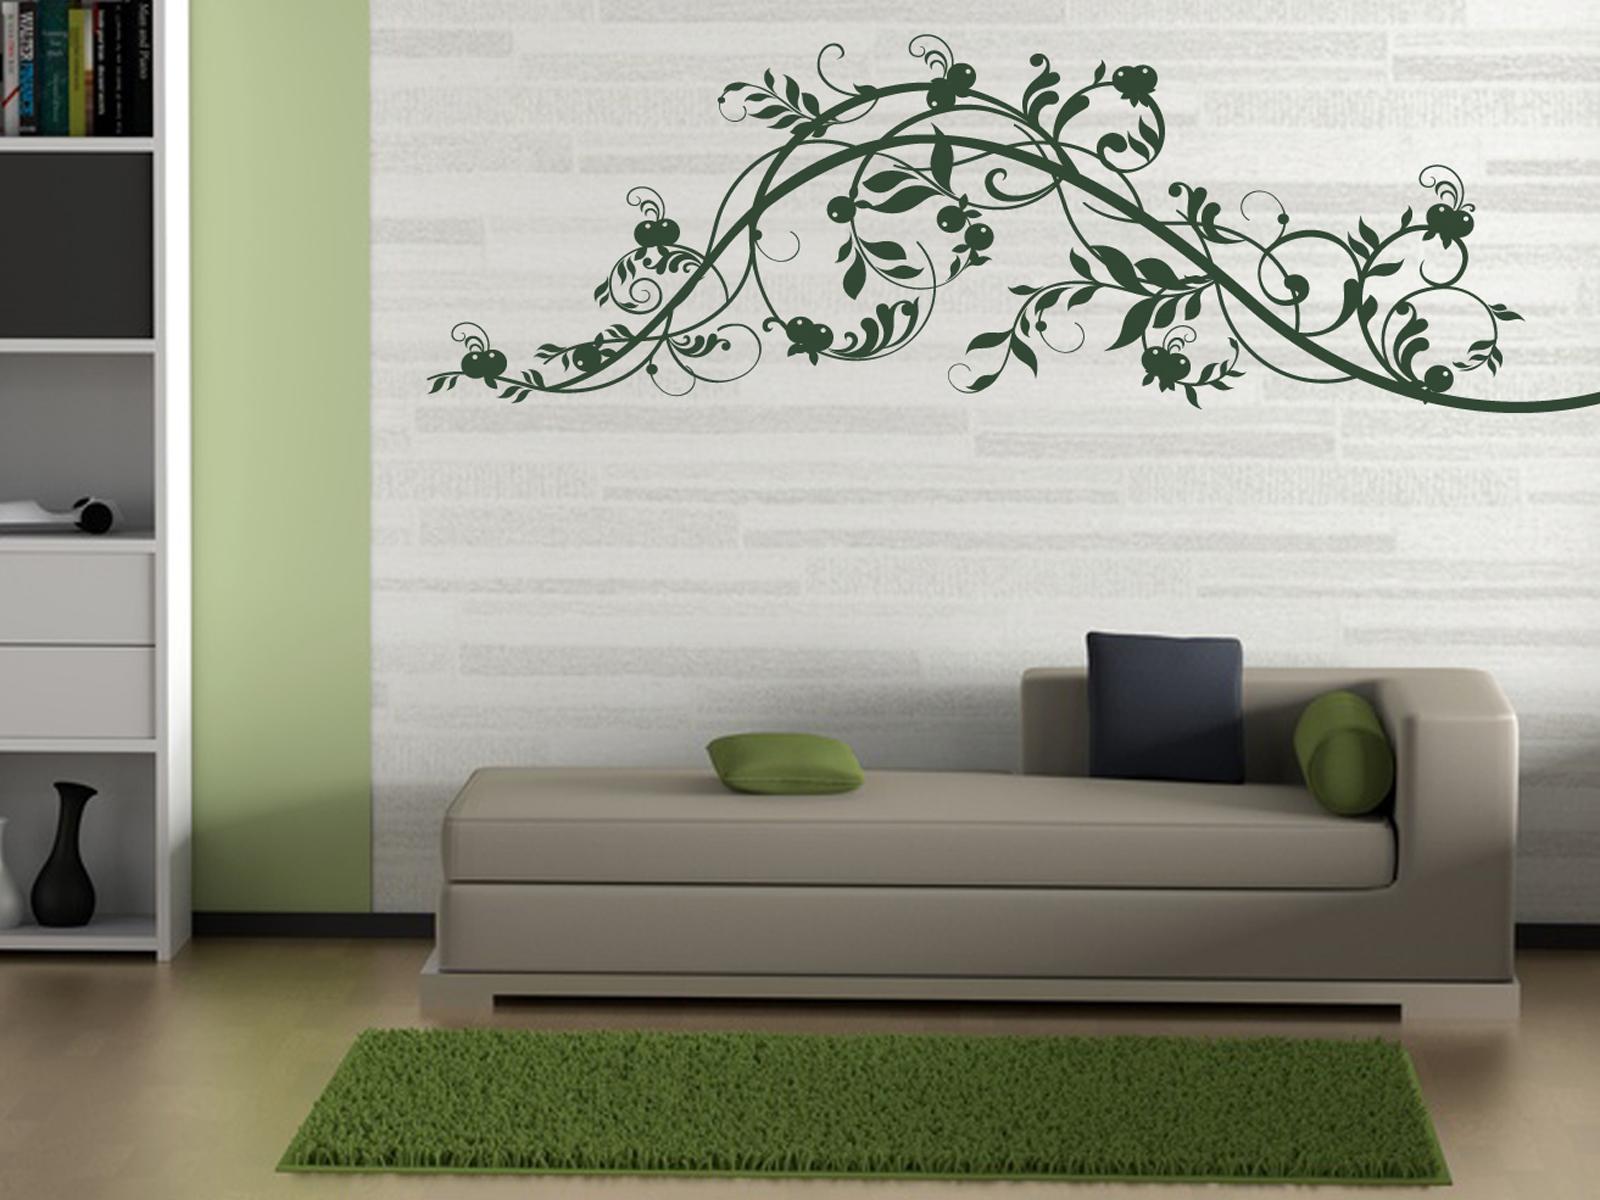 xxl wandtattoo ranke mit beeren doarts. Black Bedroom Furniture Sets. Home Design Ideas